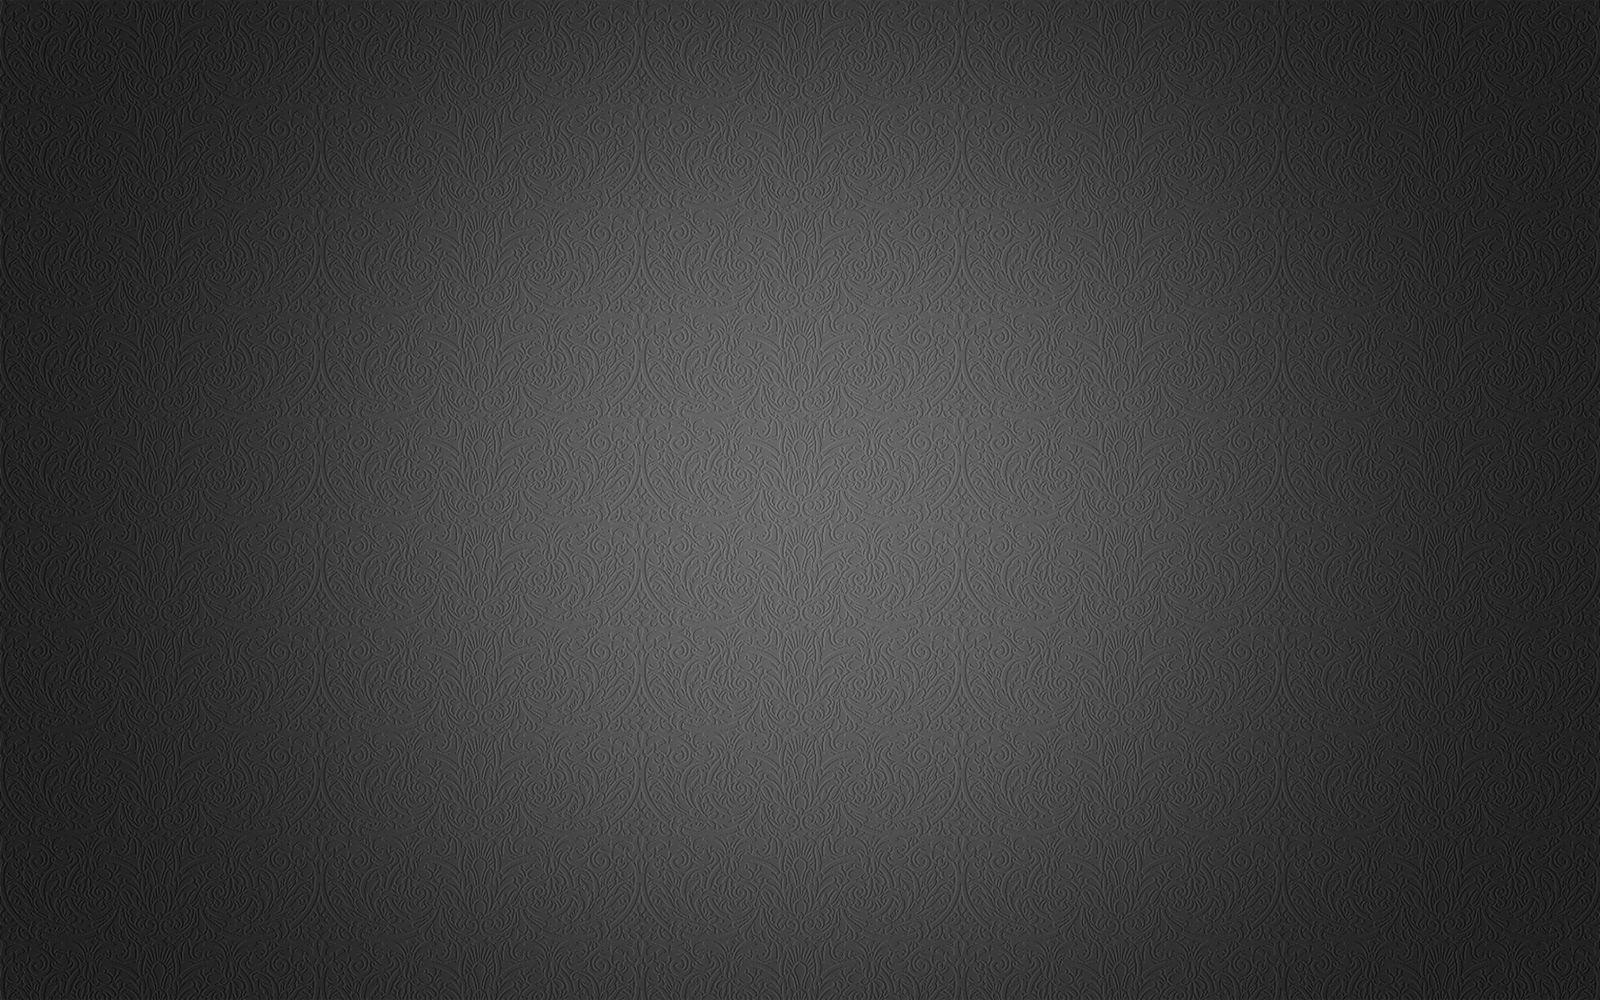 Grey Hd Wallpapers Group Grey Wallpaper Grey Wallpaper Desktop Live Wallpapers